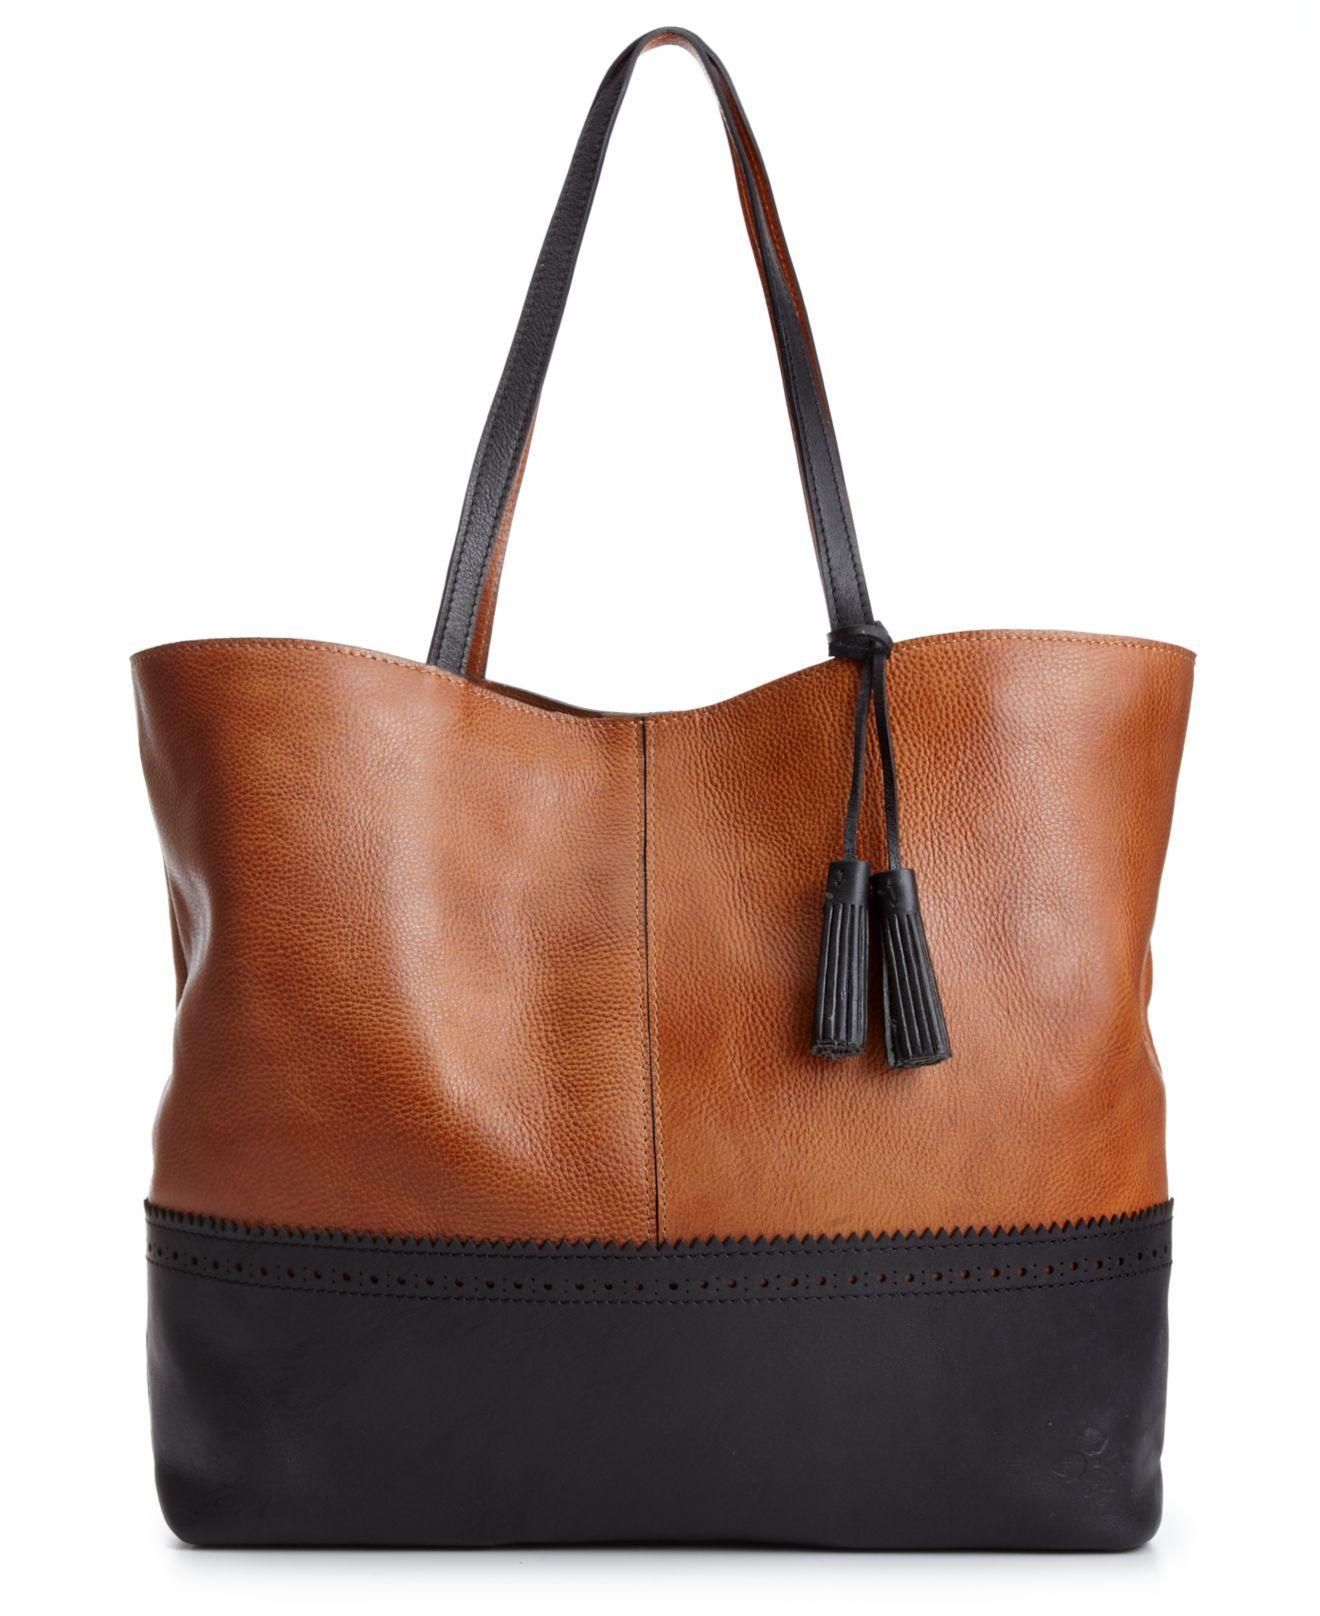 Patricia Nash Handbag Londra Tote Handbags Accessories Macy S